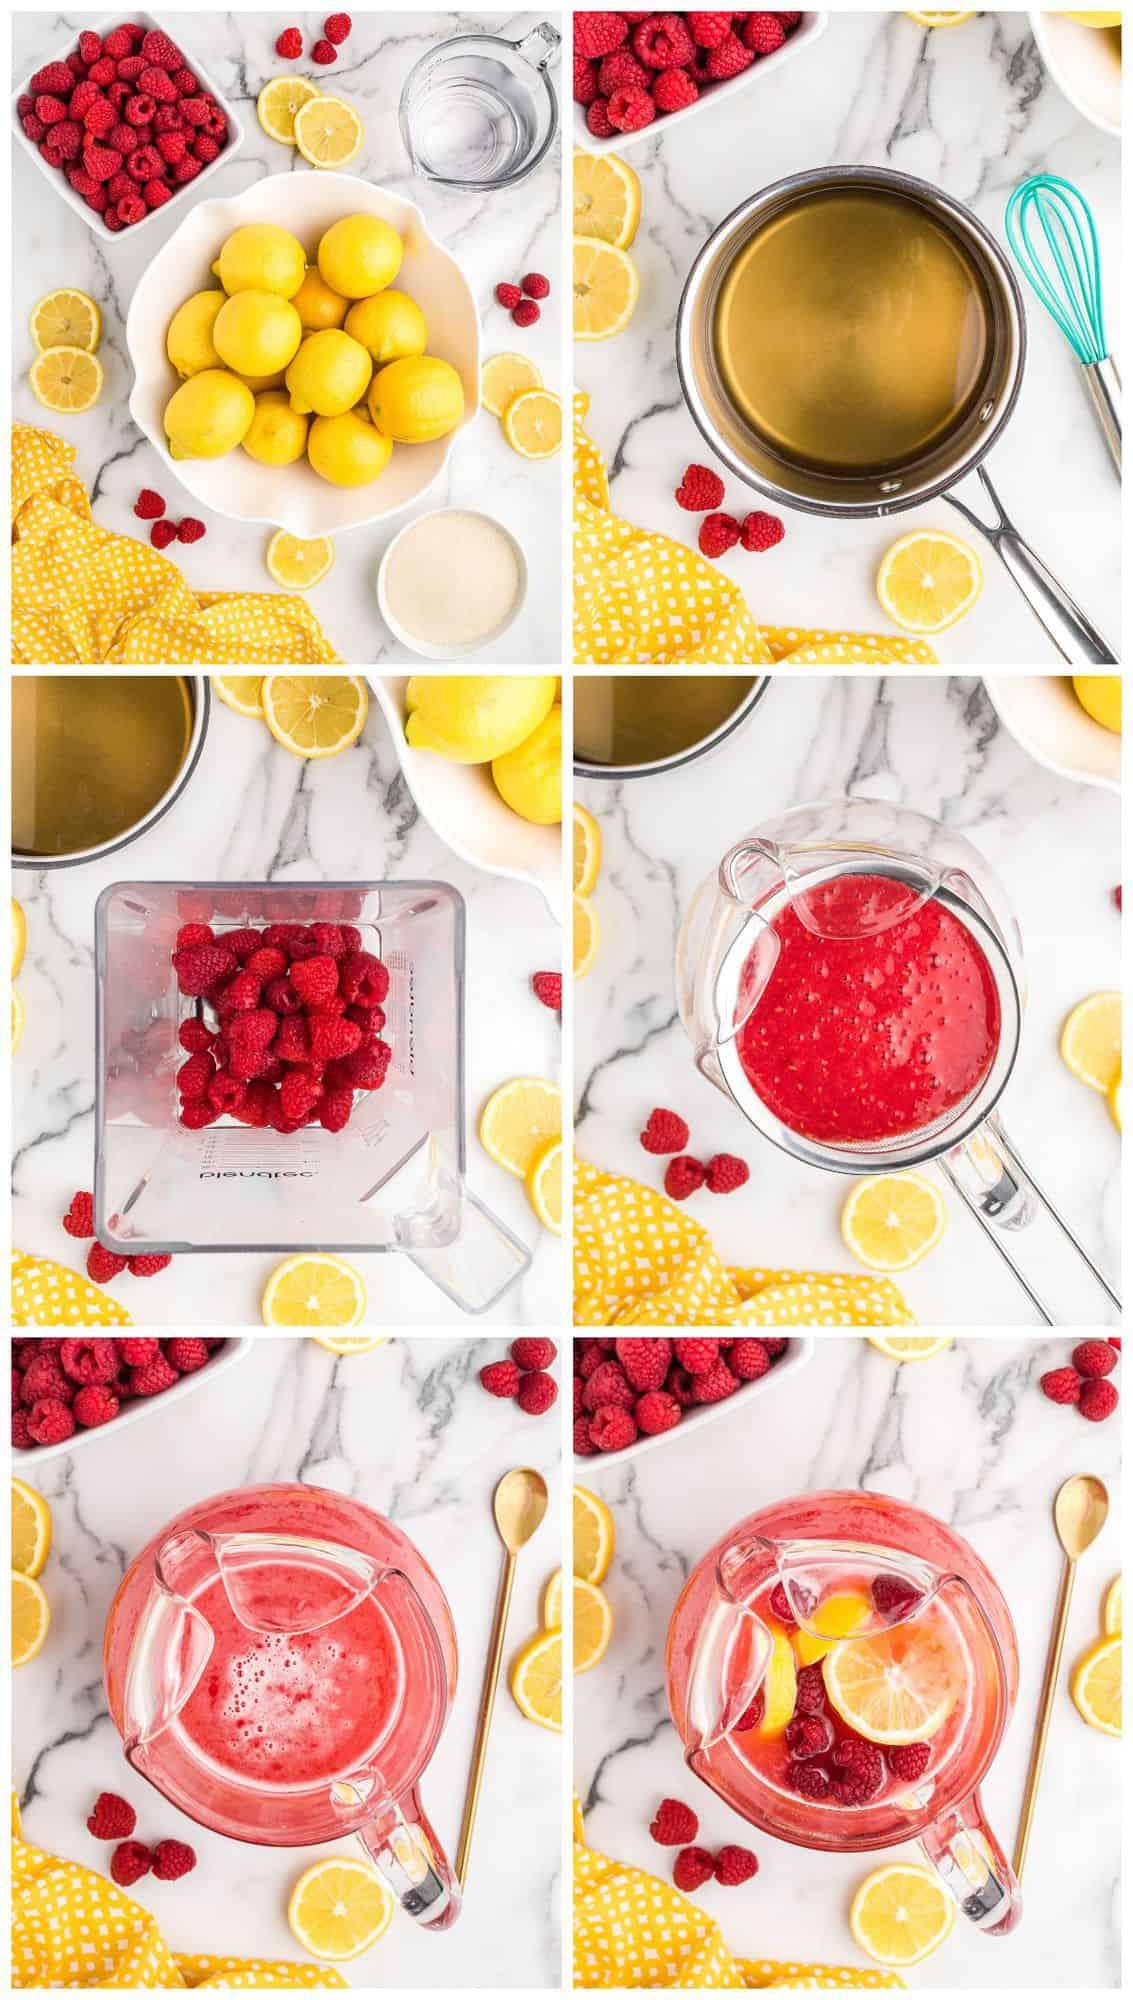 step by step photos for how to make raspberry lemonade